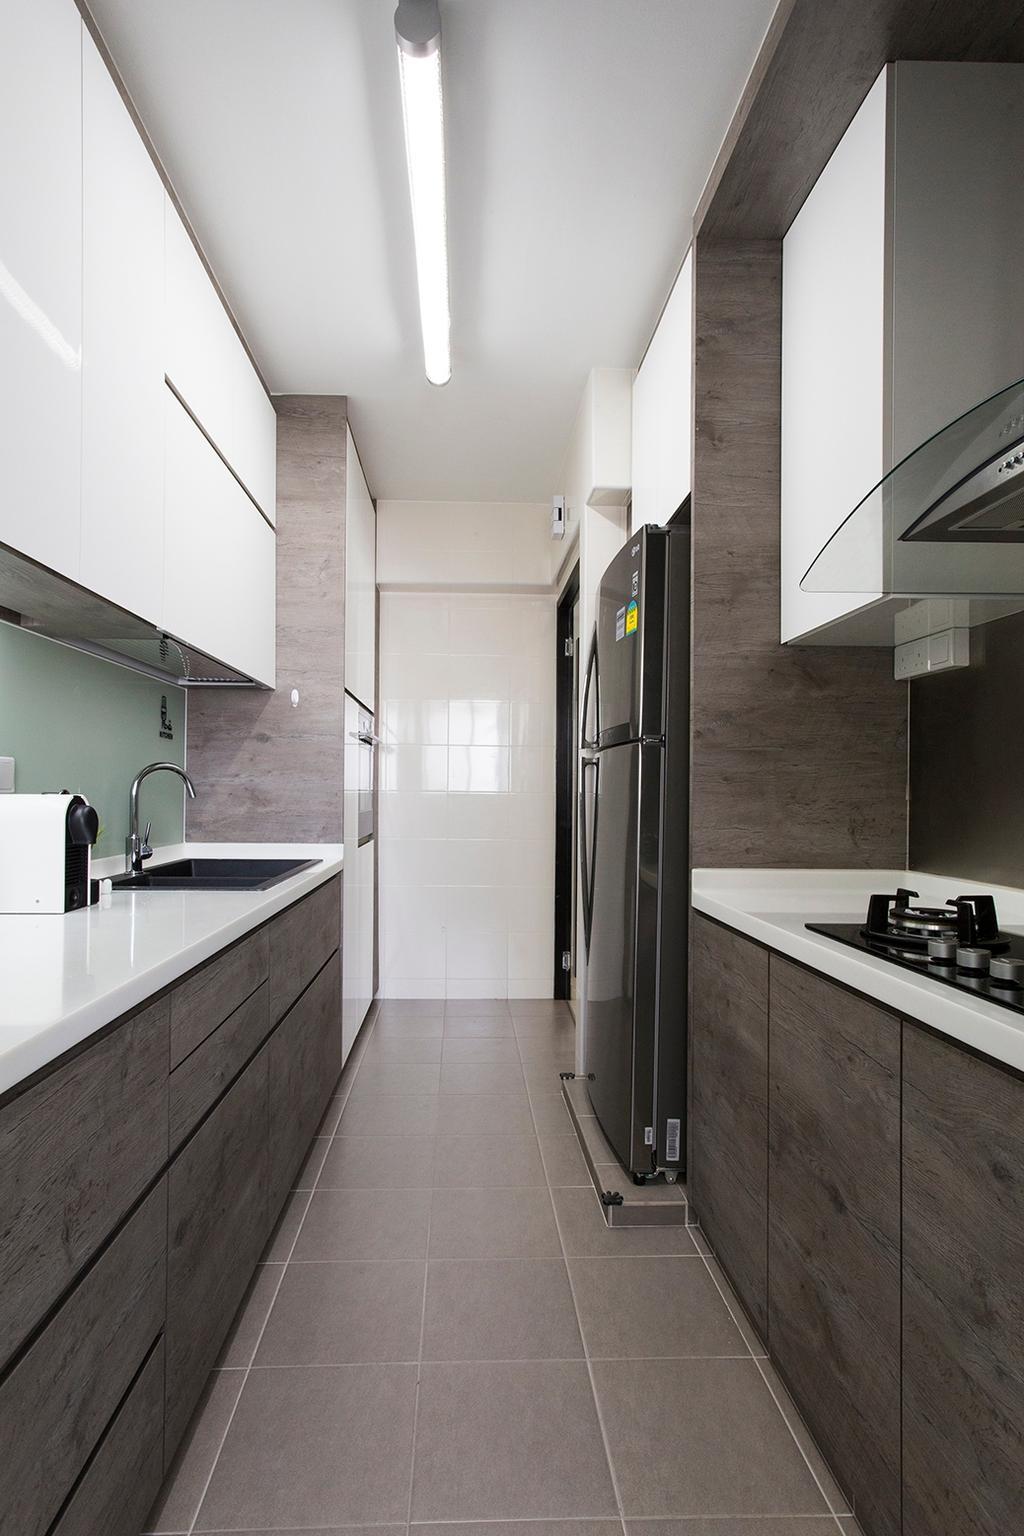 Scandinavian, HDB, Kitchen, Punggol Ripples (Block 211A), Interior Designer, Icon Interior Design, Parallel, Gallery Kitchen, Monochrome, Tiles, Gray, Grey, White Light, Workspace, Kitchen Counter, Countertop, Solid Counterop